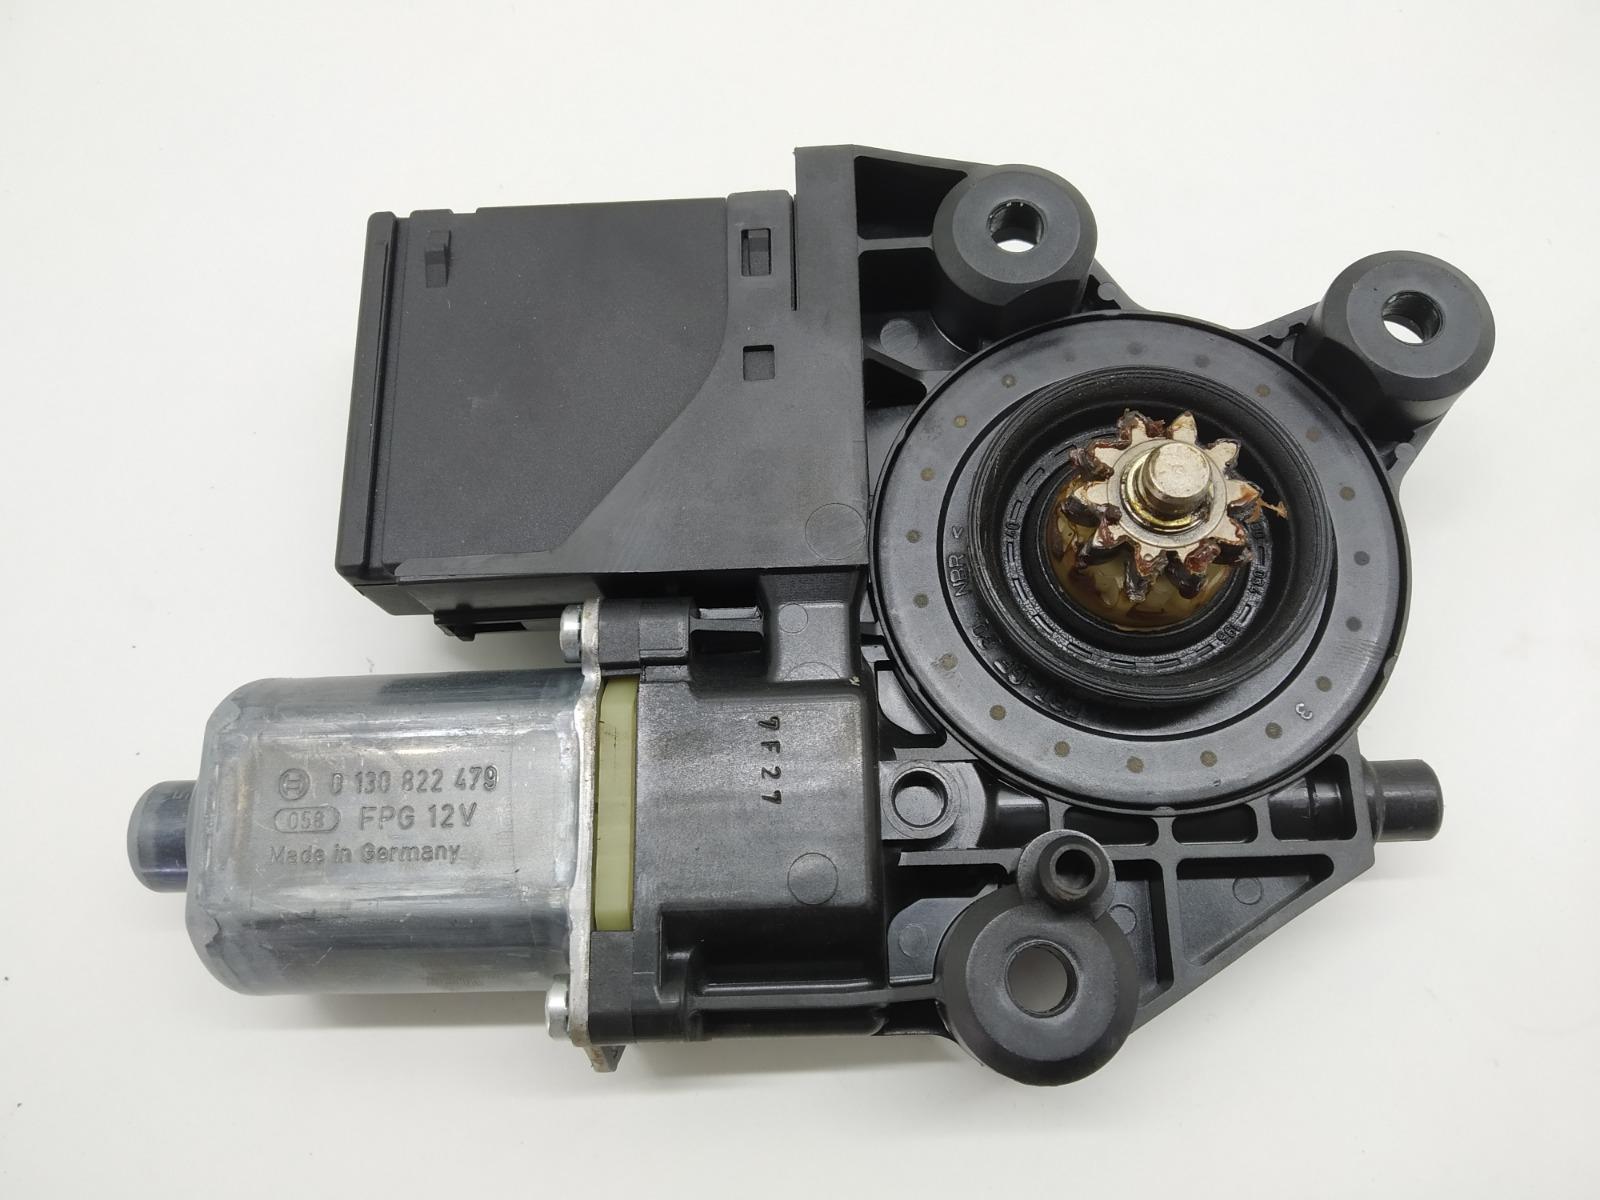 Моторчик стеклоподъемника передний левый Renault Grand Scenic 1.5 DCI 2010 (б/у)